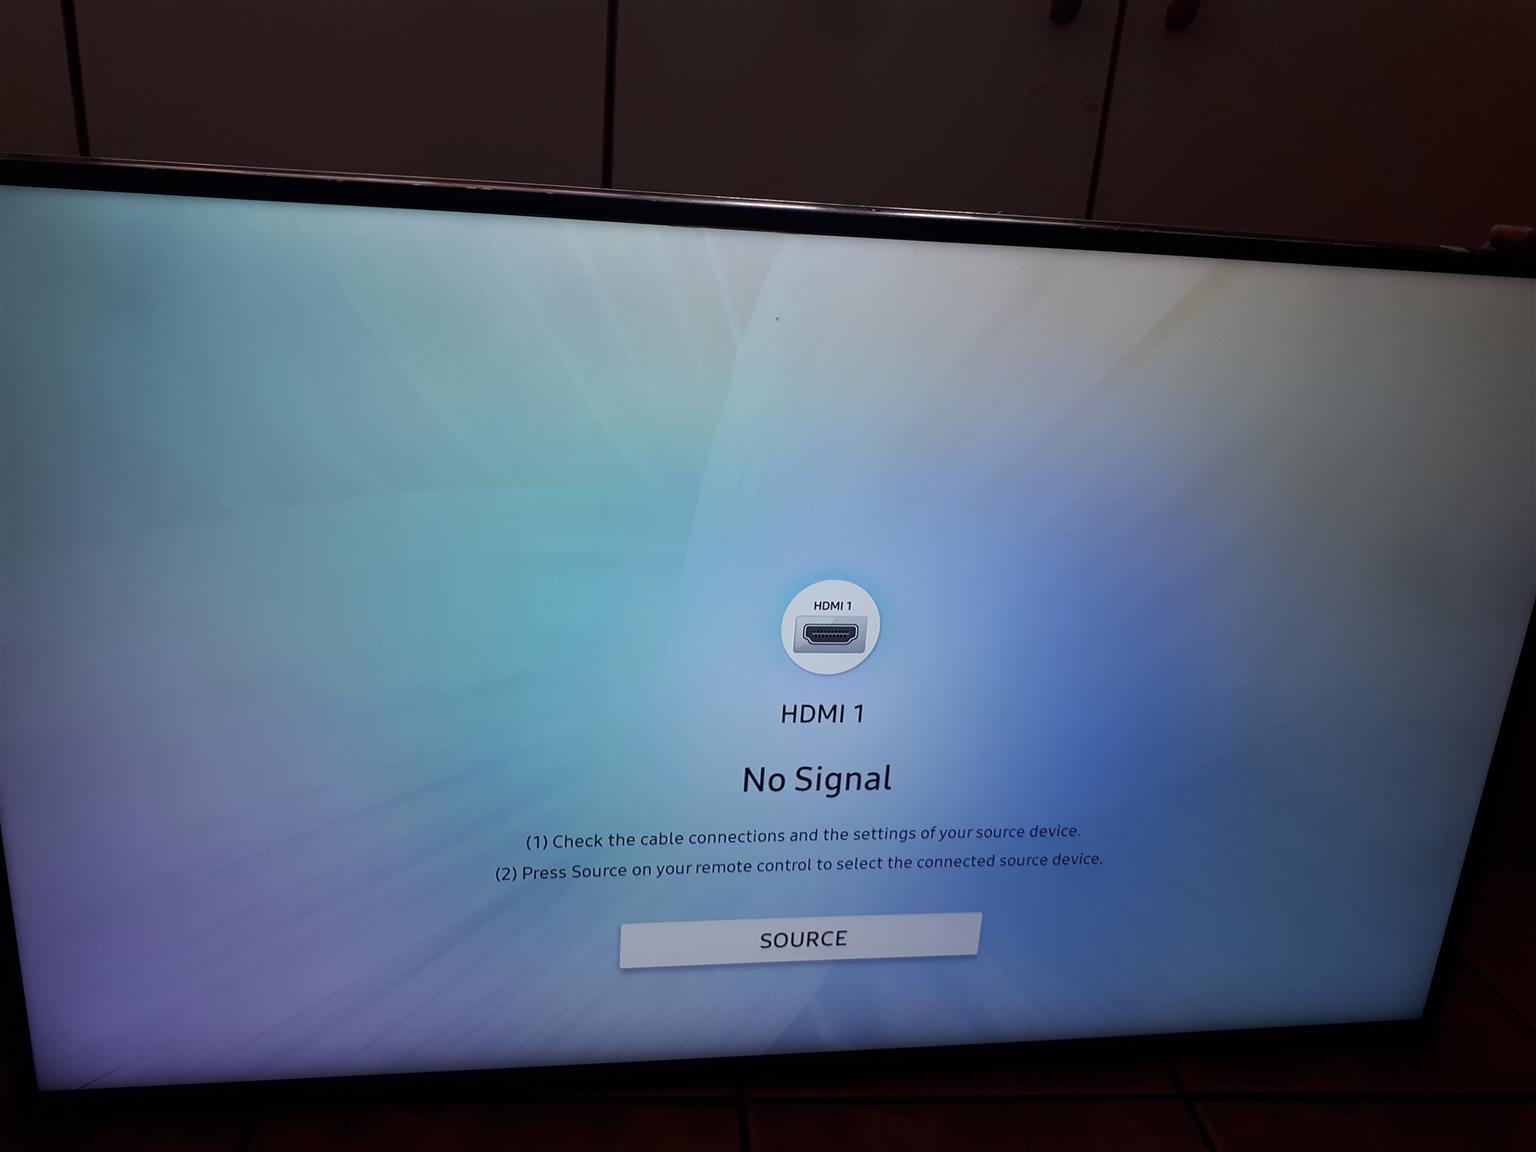 Samsung smart tv 4k UHD for sale